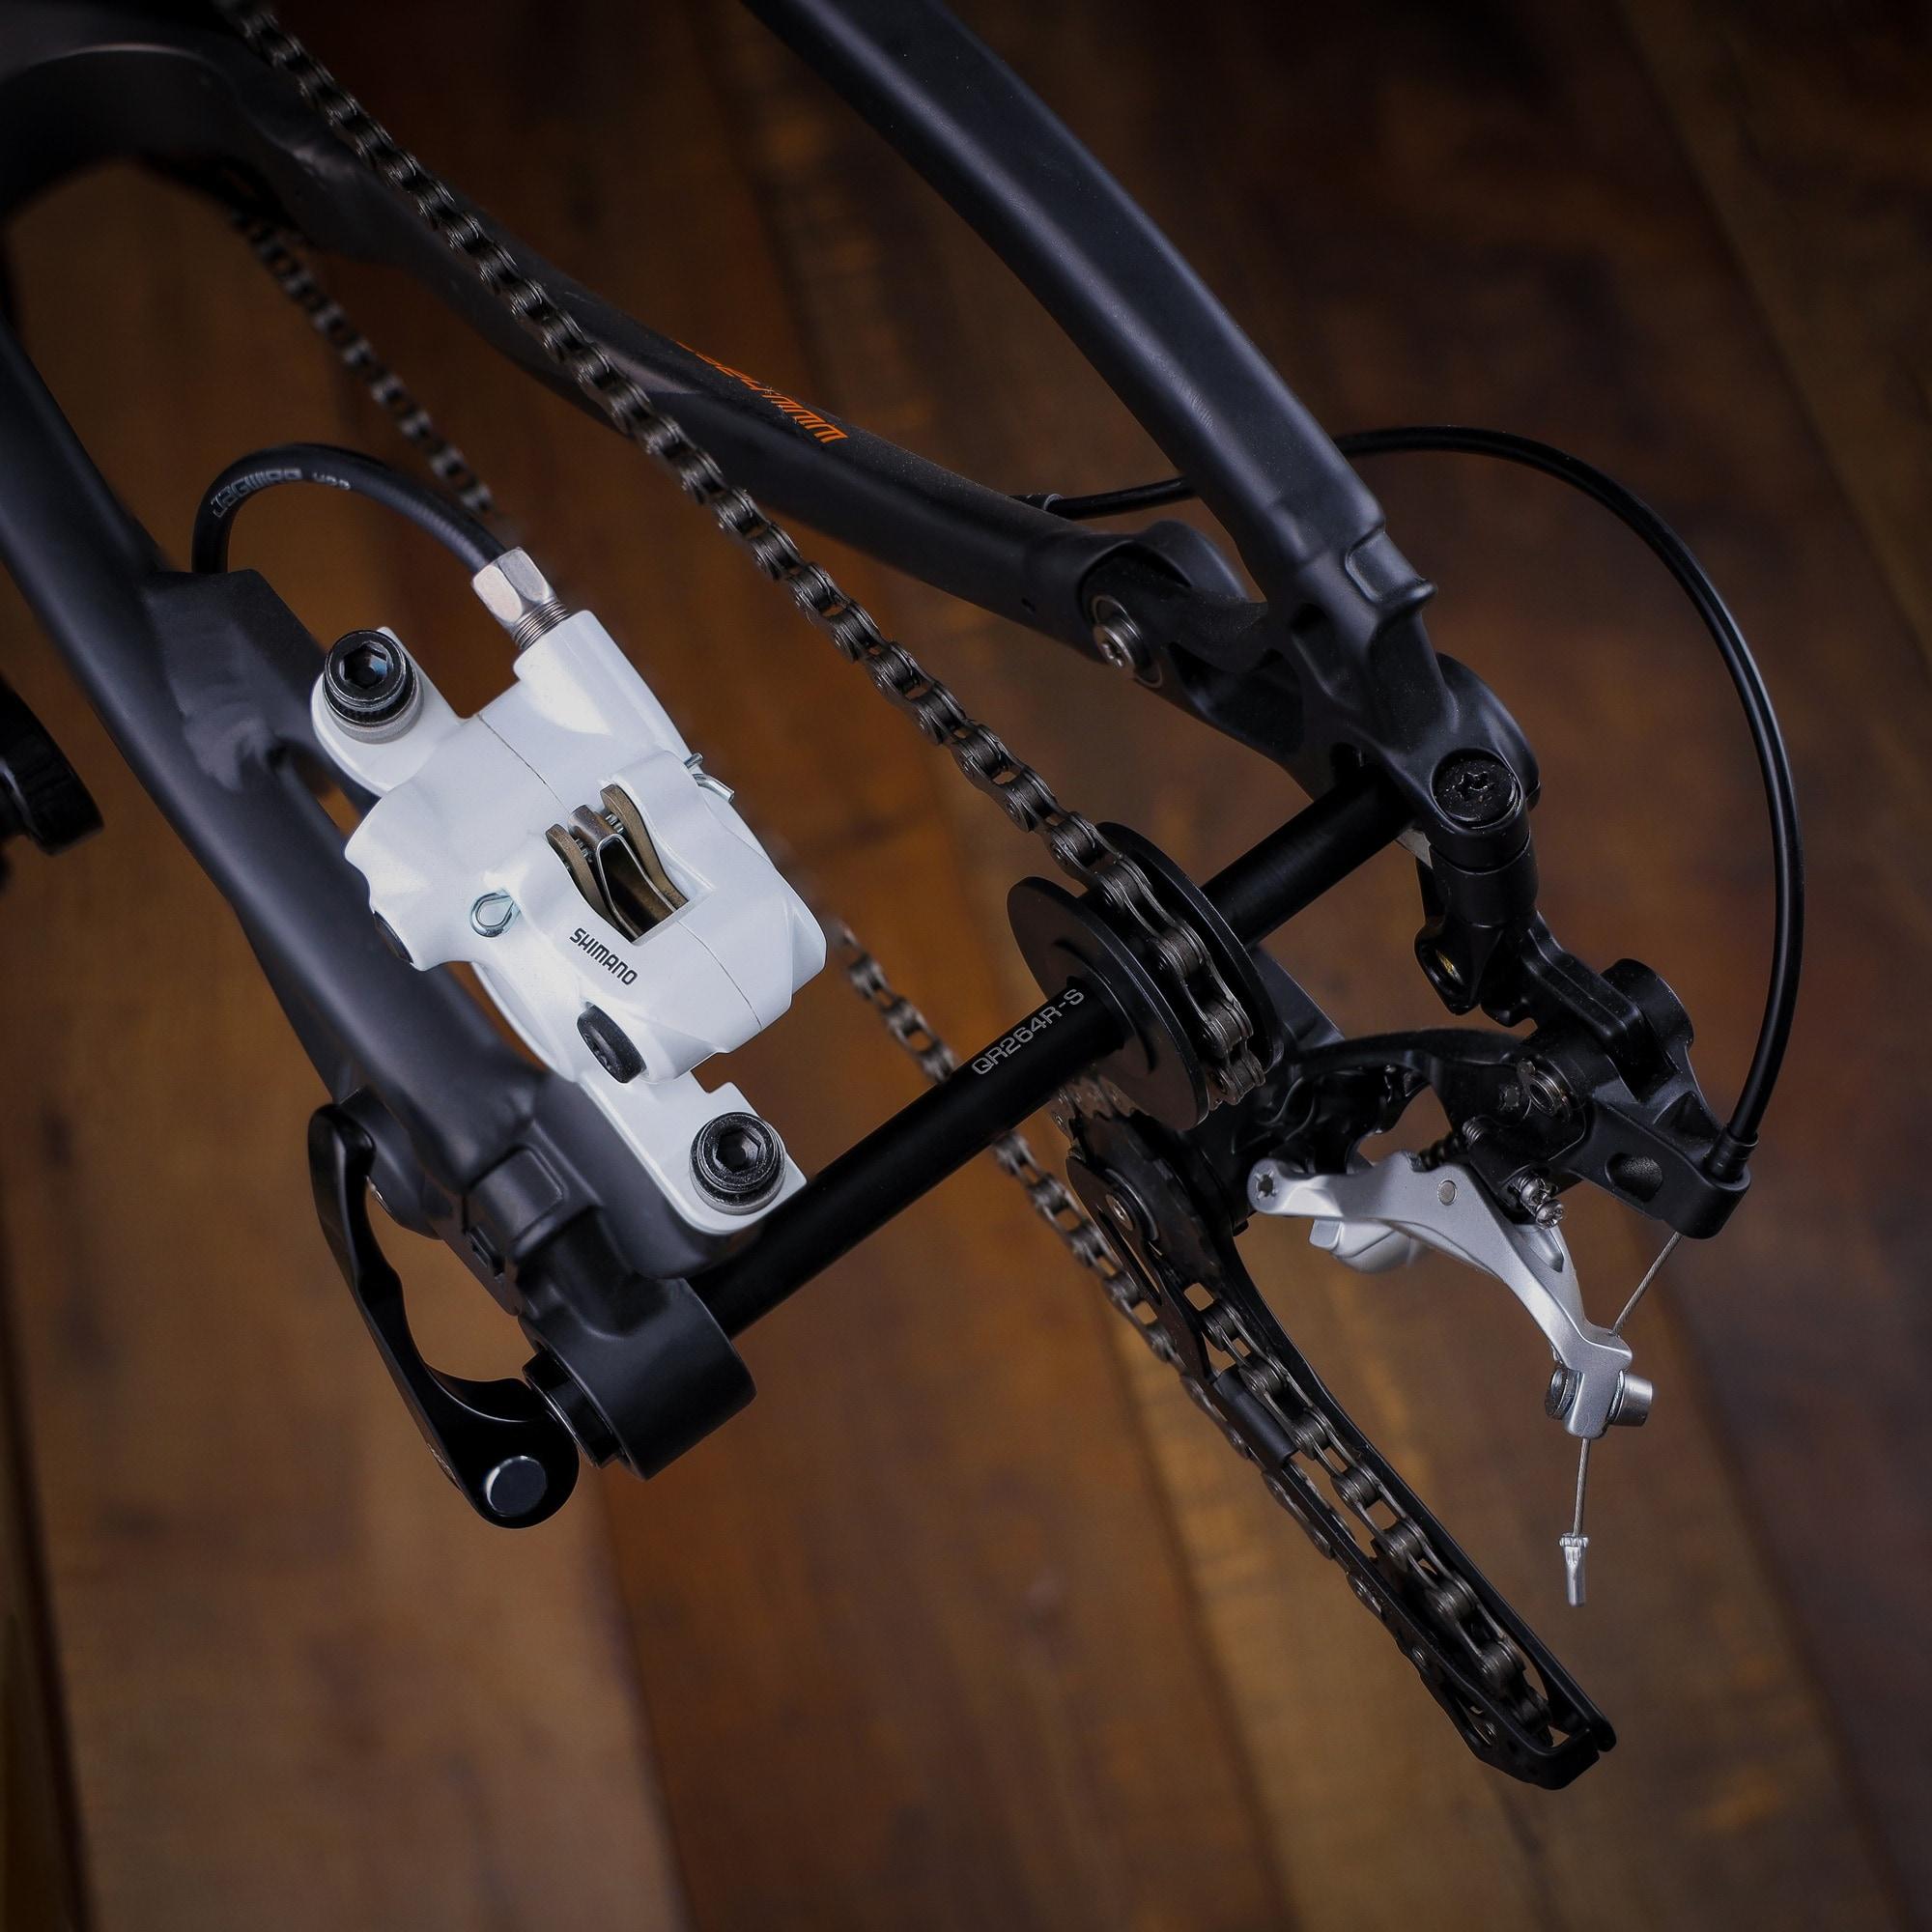 Dummy Hub Bicycle Bike Cycle Chain Keeper MTB Thru Axle Remover Extractor Tool